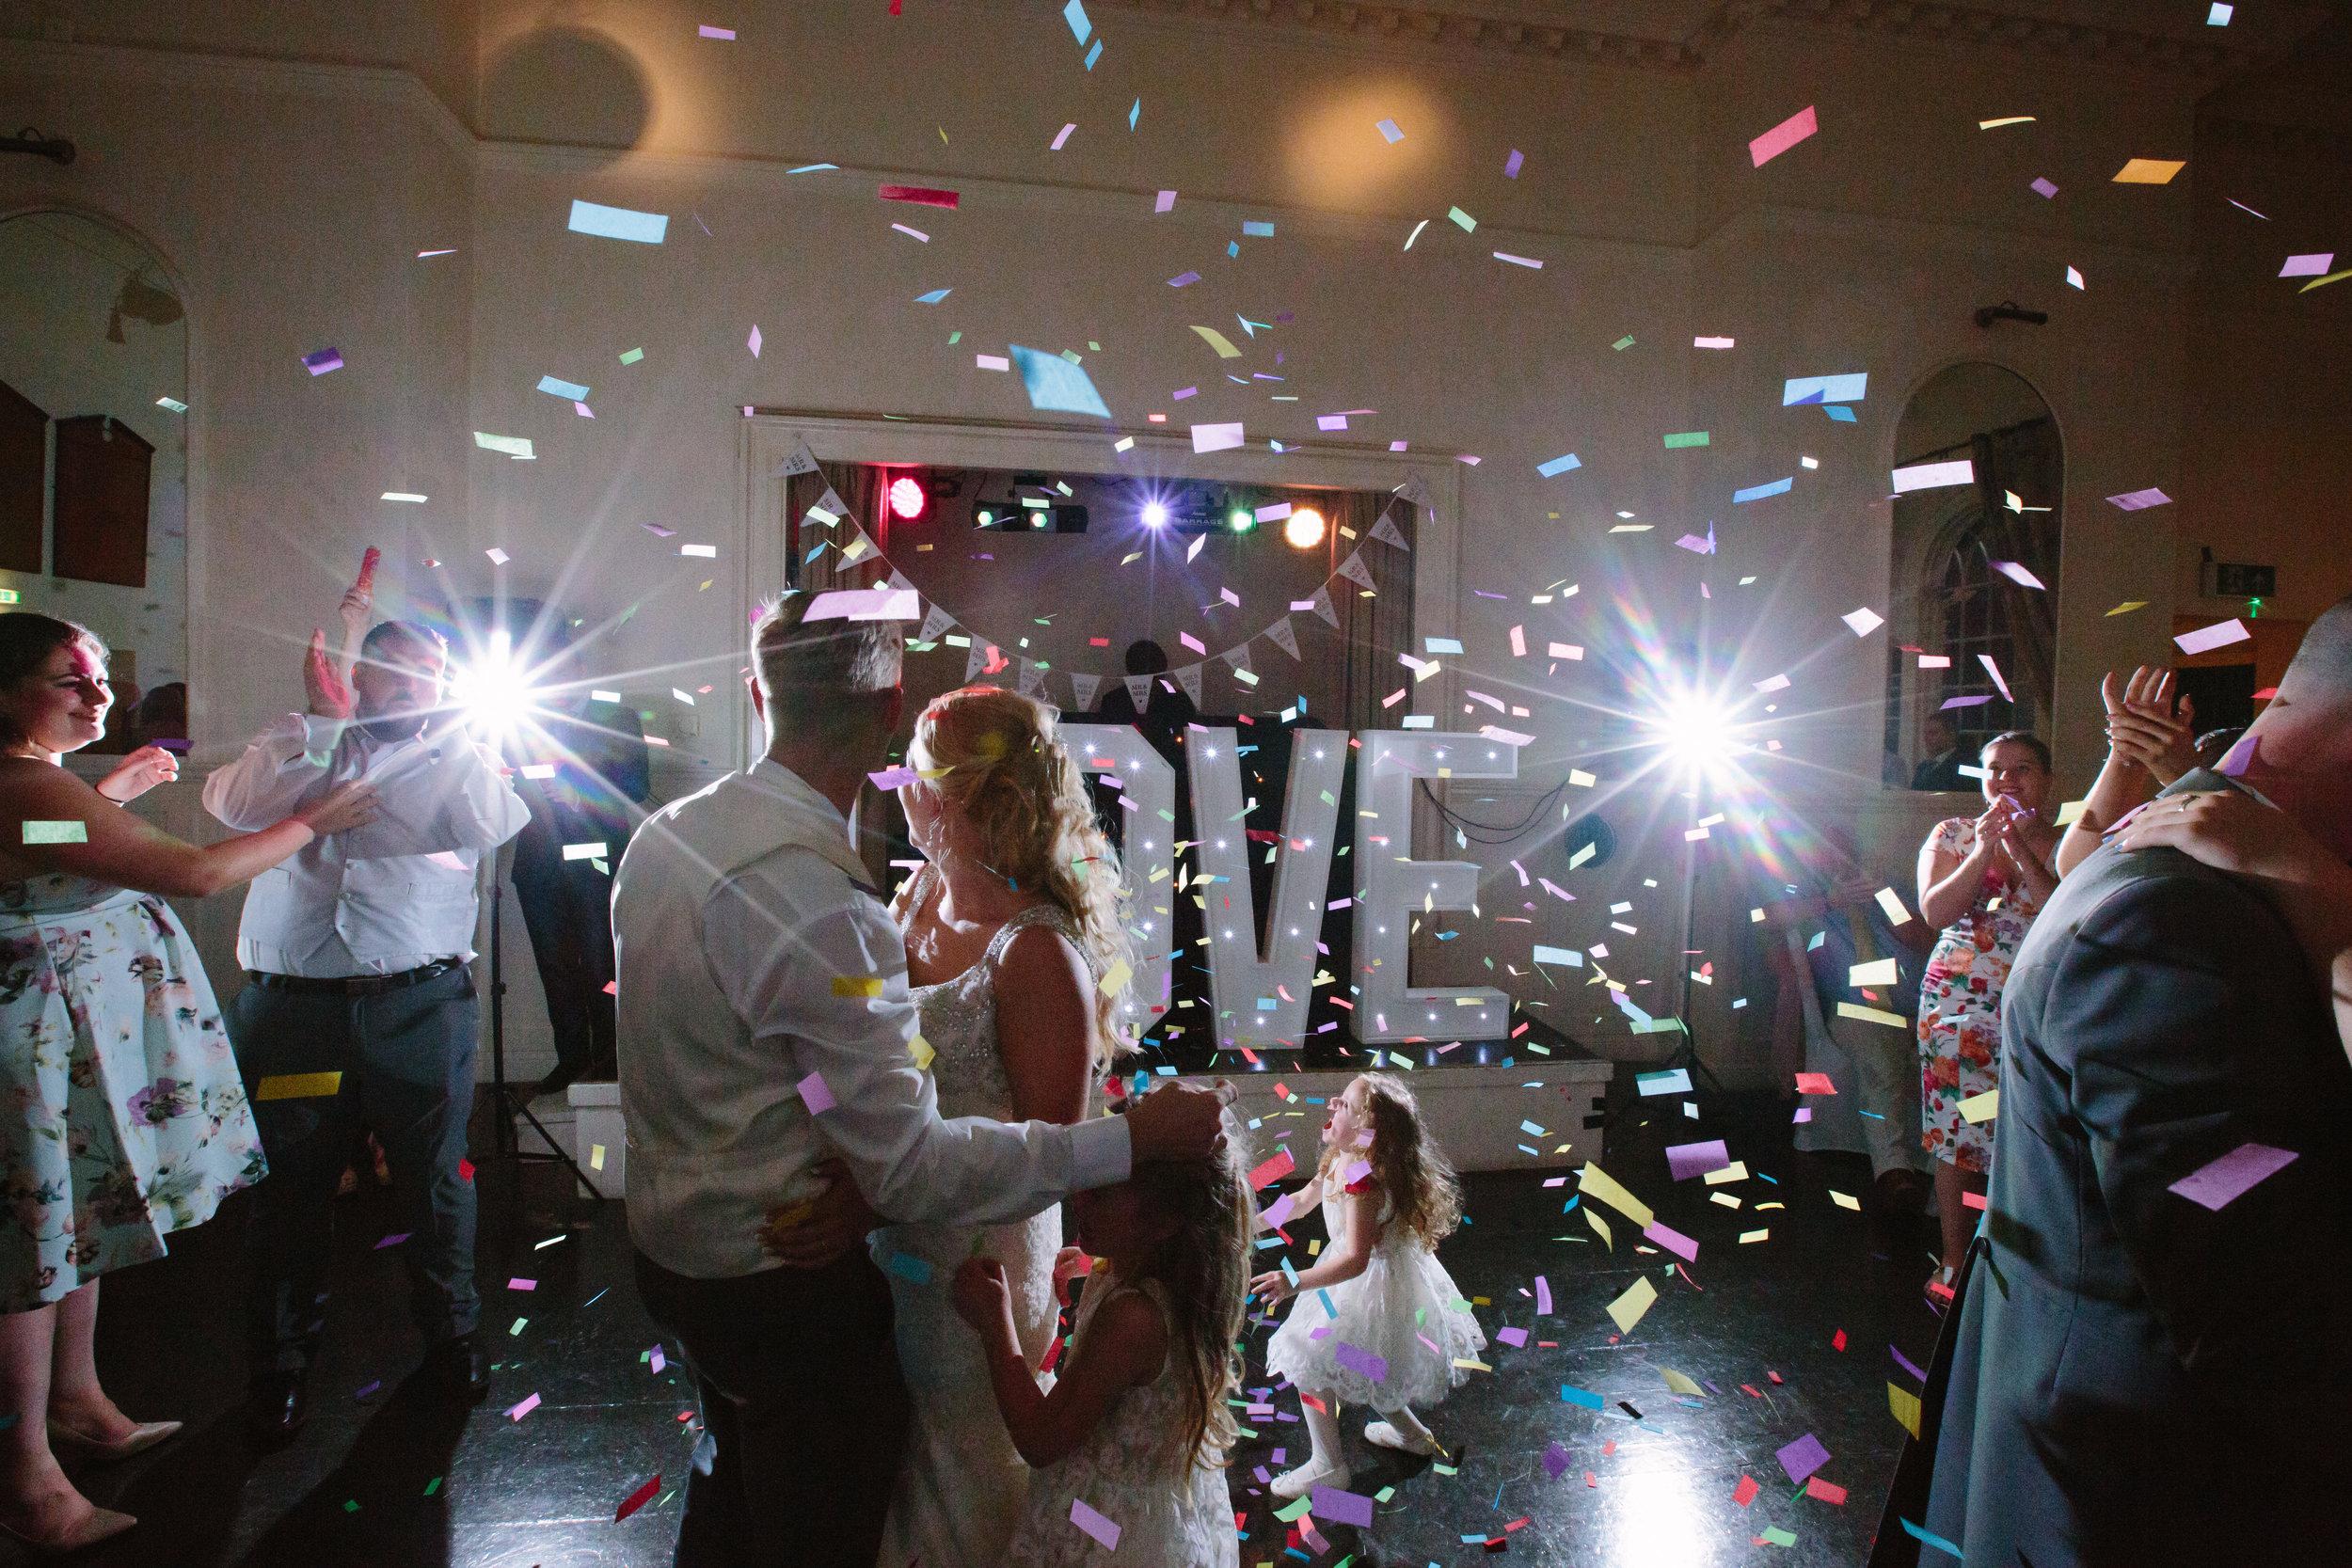 hitchin-hertfordshire-london-wedding-photography-catholic-church-first-dance-confetti-53